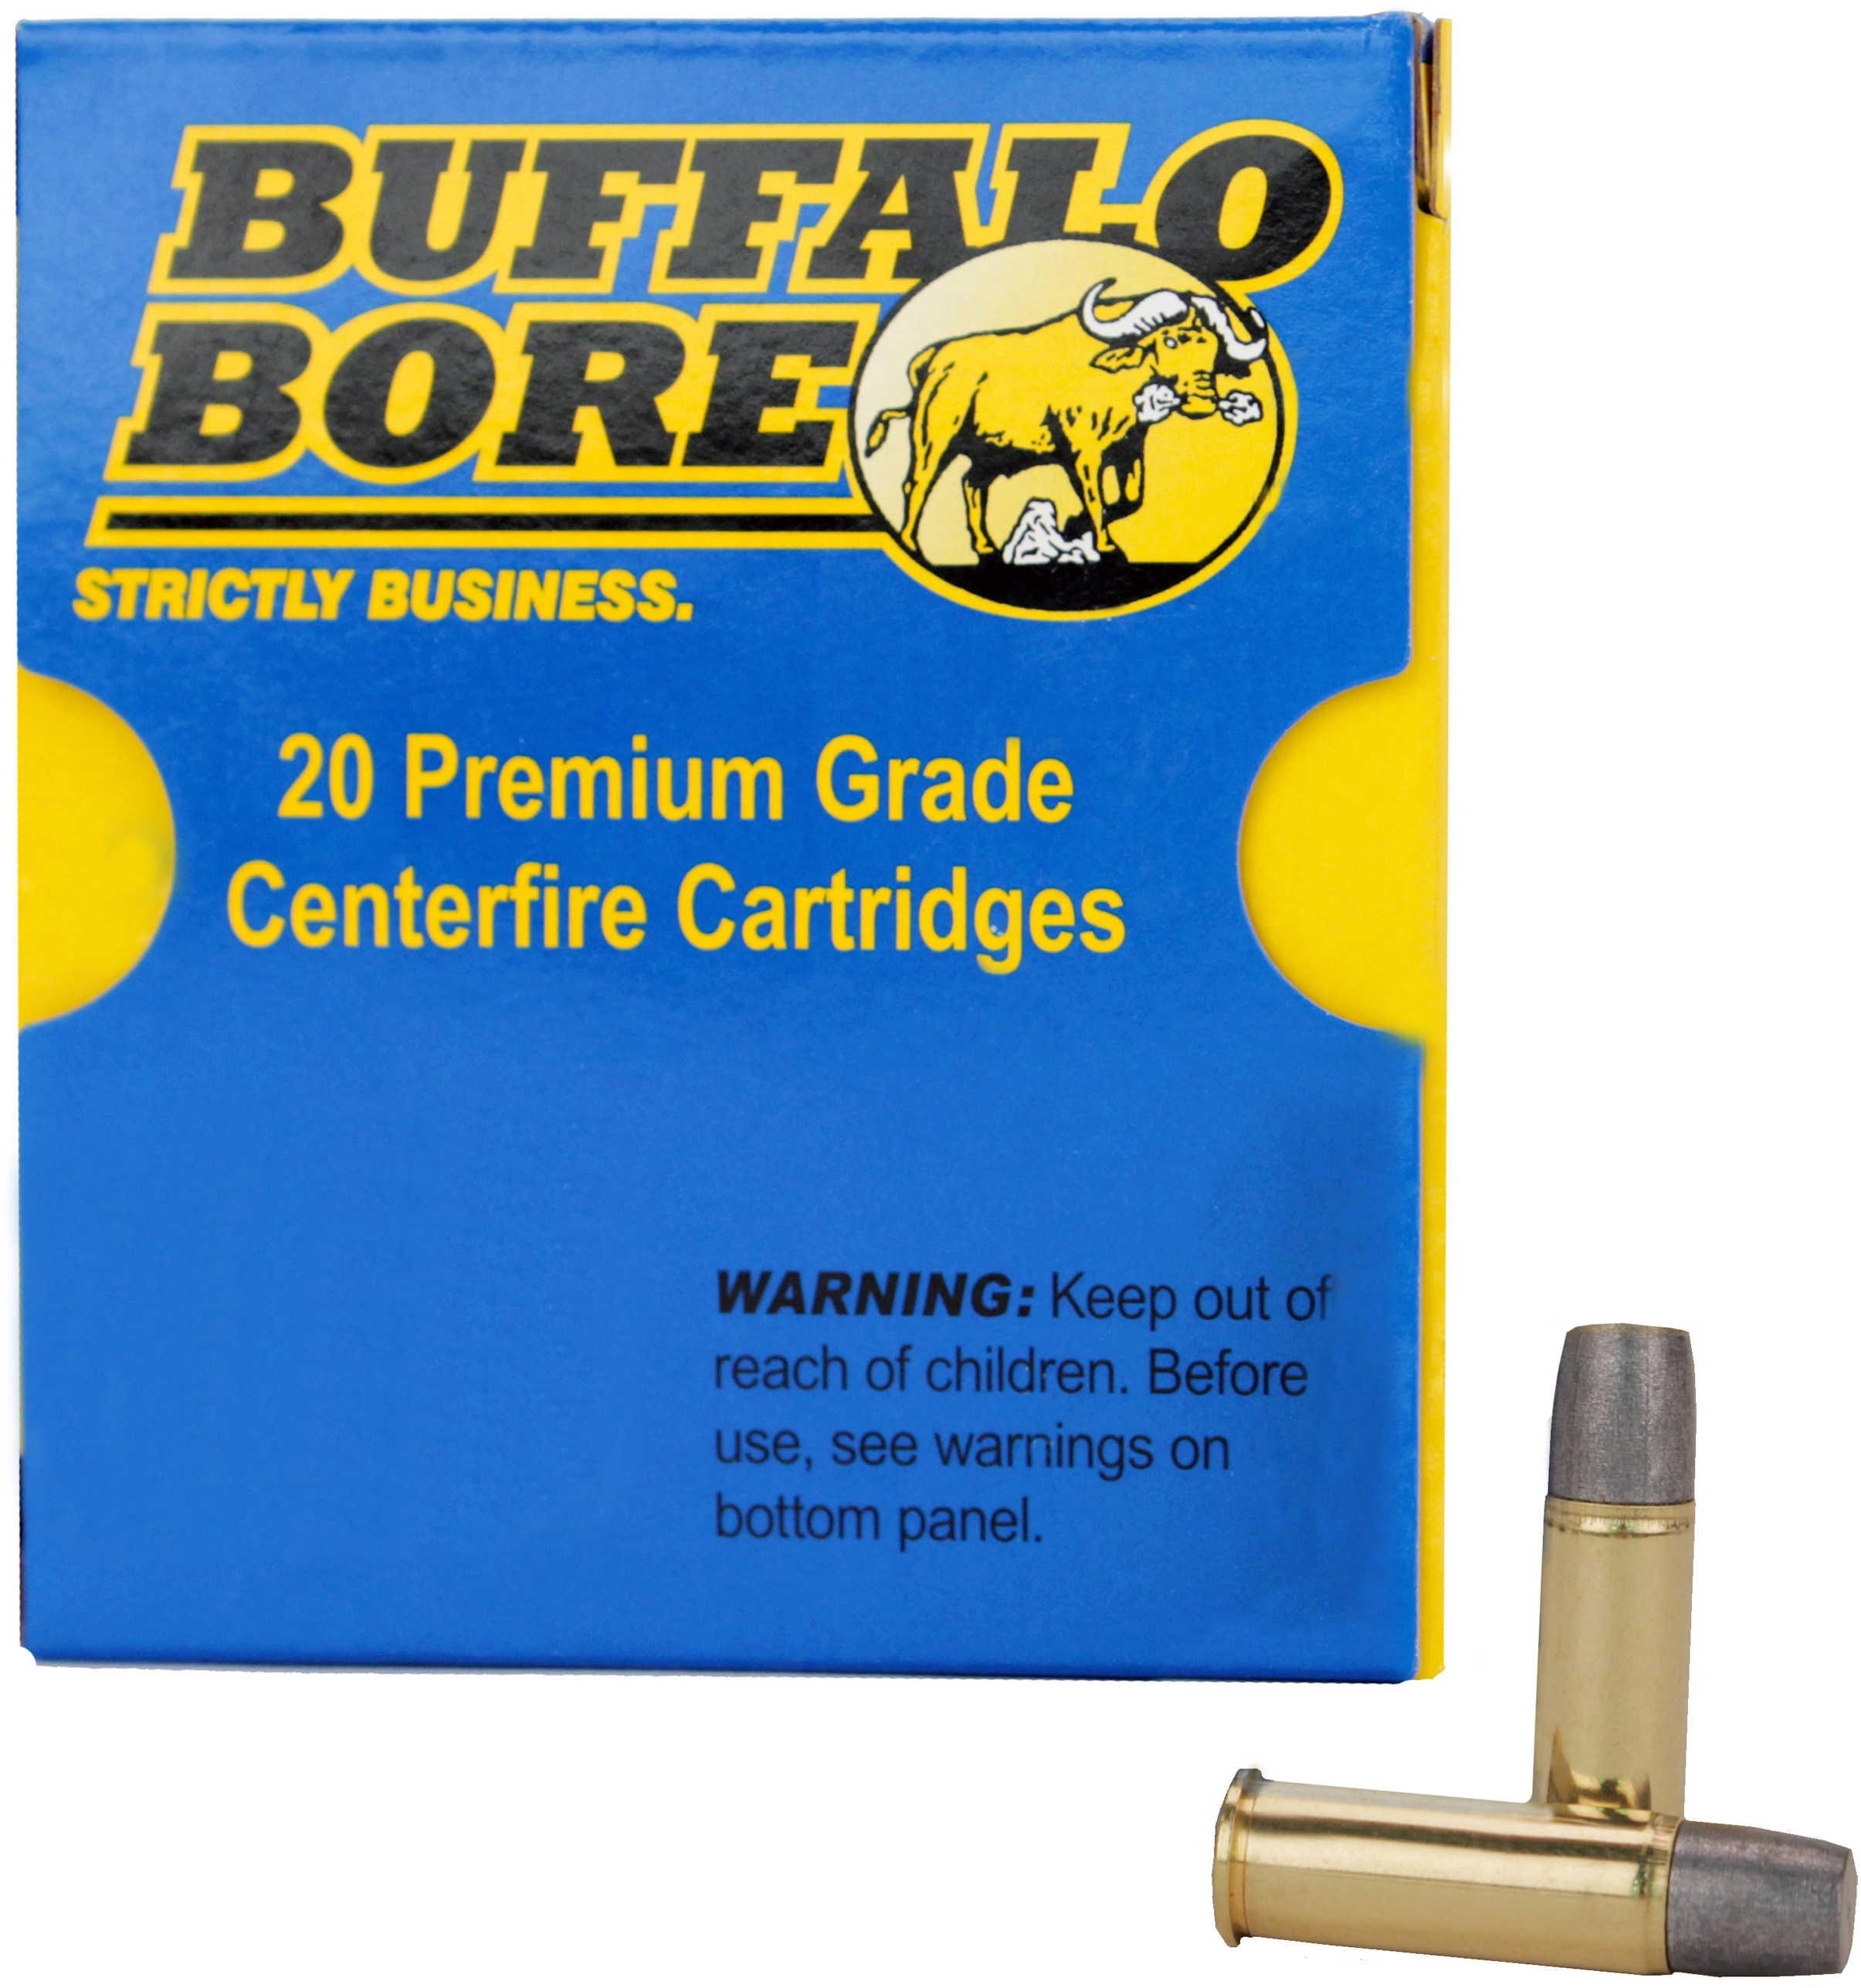 Buffalo Bore Ammunition Handgun 44 Rem Mag Hard Cast 340 Grains 20 Rounds Per Box 4D/20